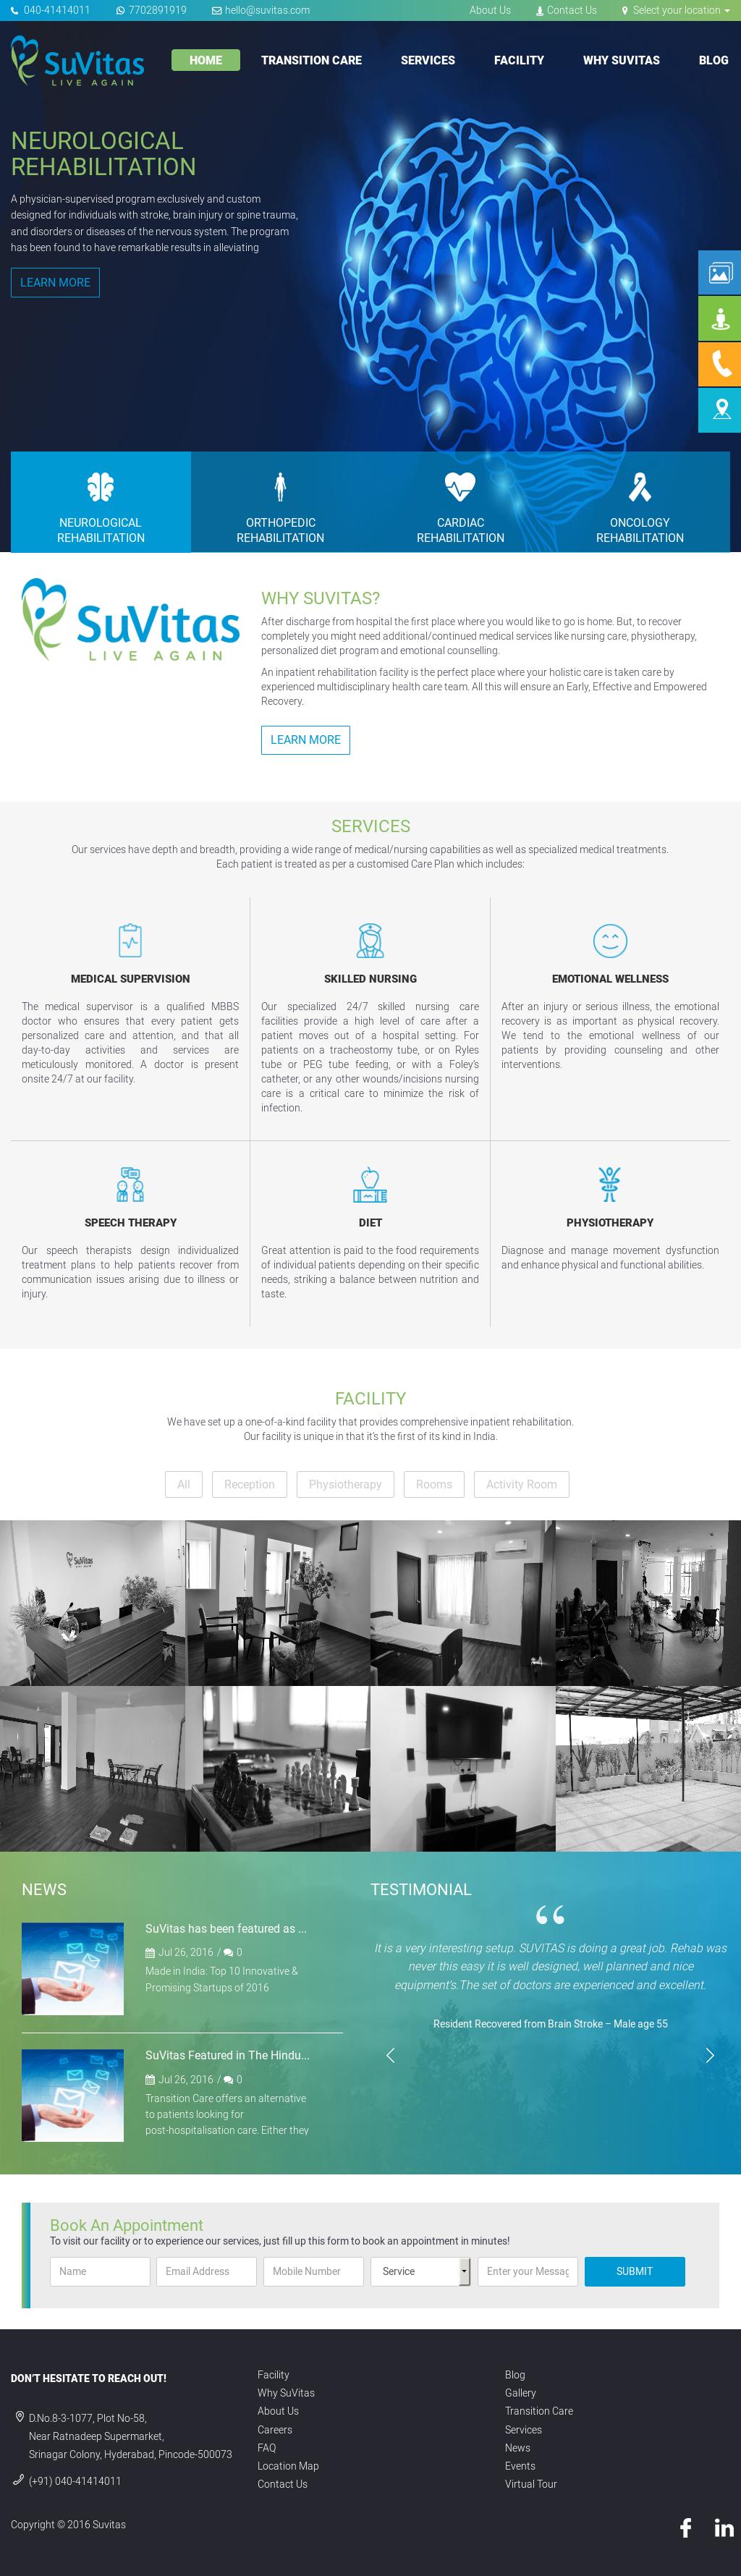 Owler Reports - SuVitas Blog SuVitas Launches Bangalore's